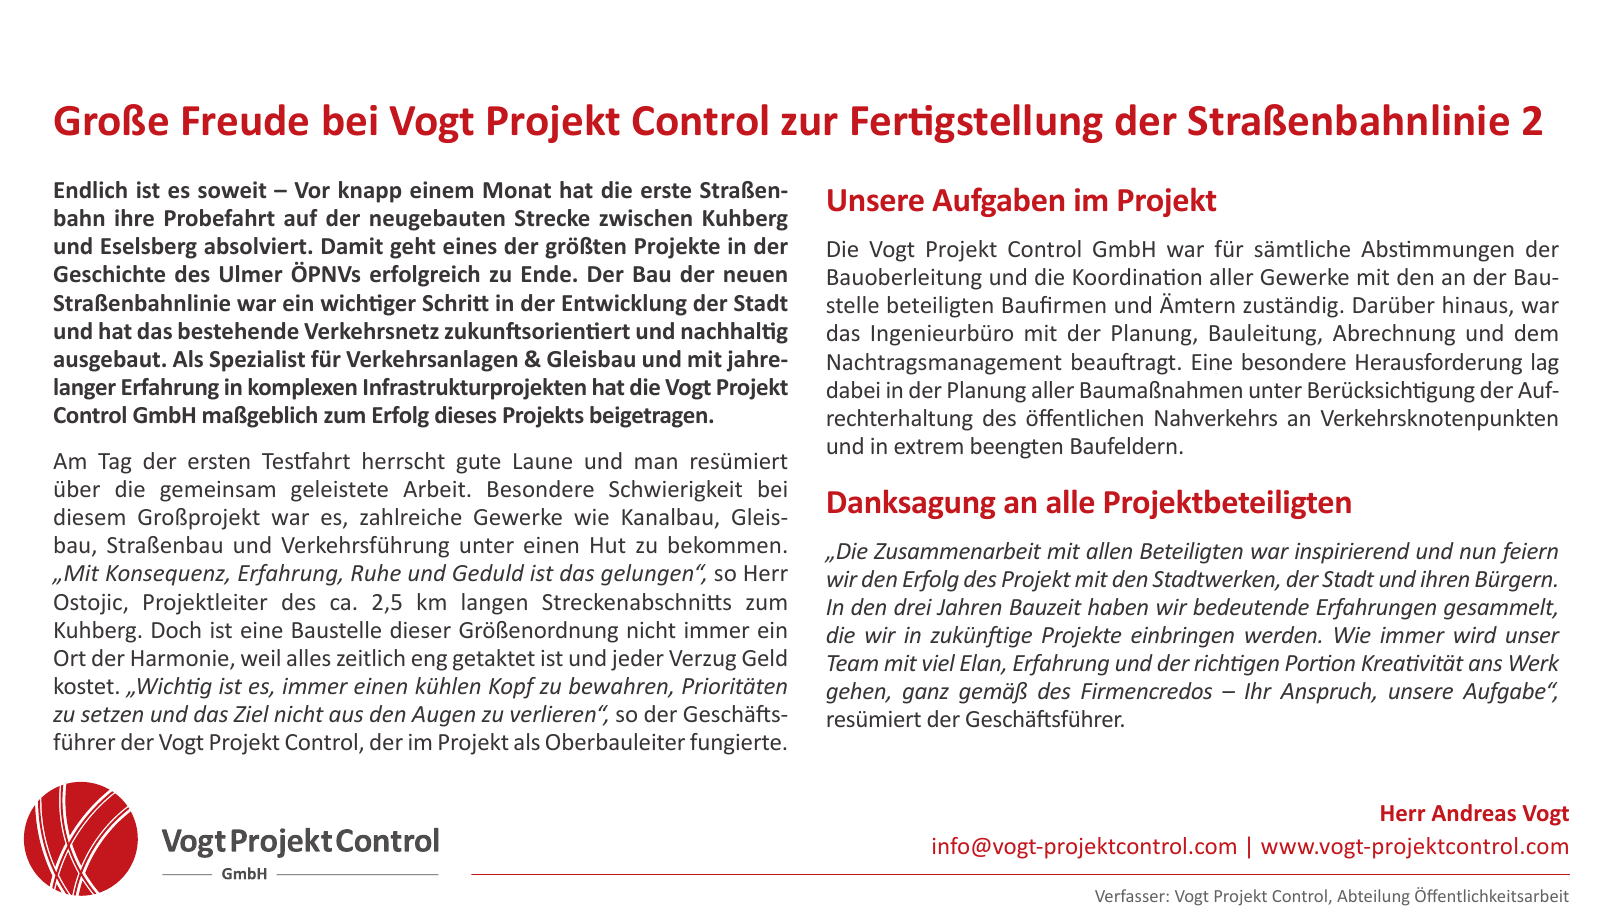 Vogt Projekt Control